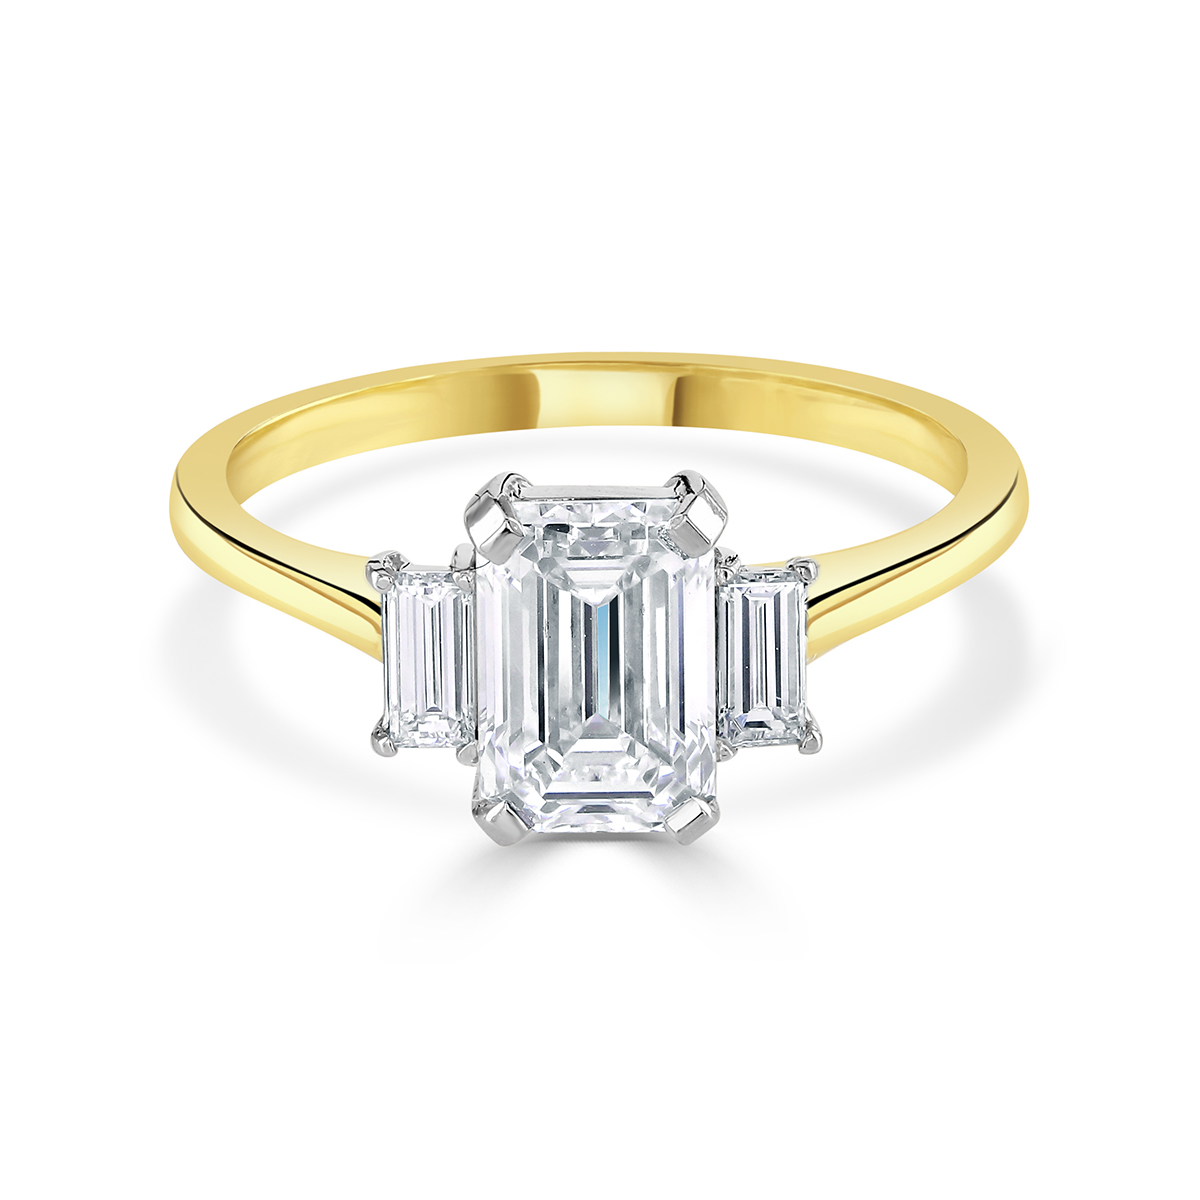 Emerald Cut Yellow Gold Trilogy Ring